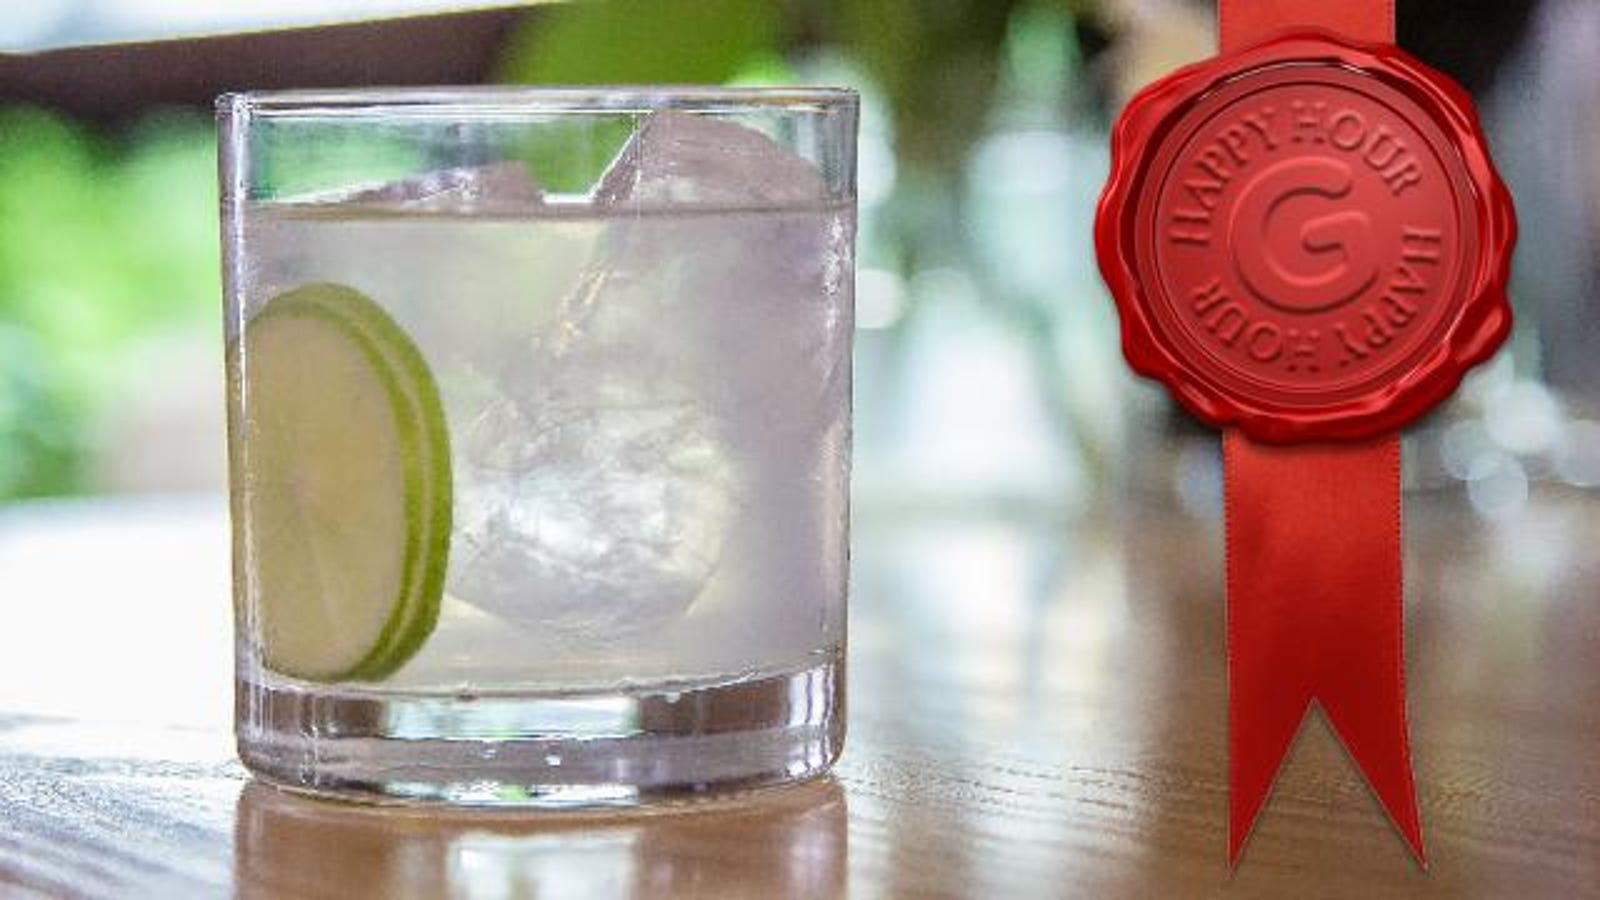 How to Make a See-Through Margarita